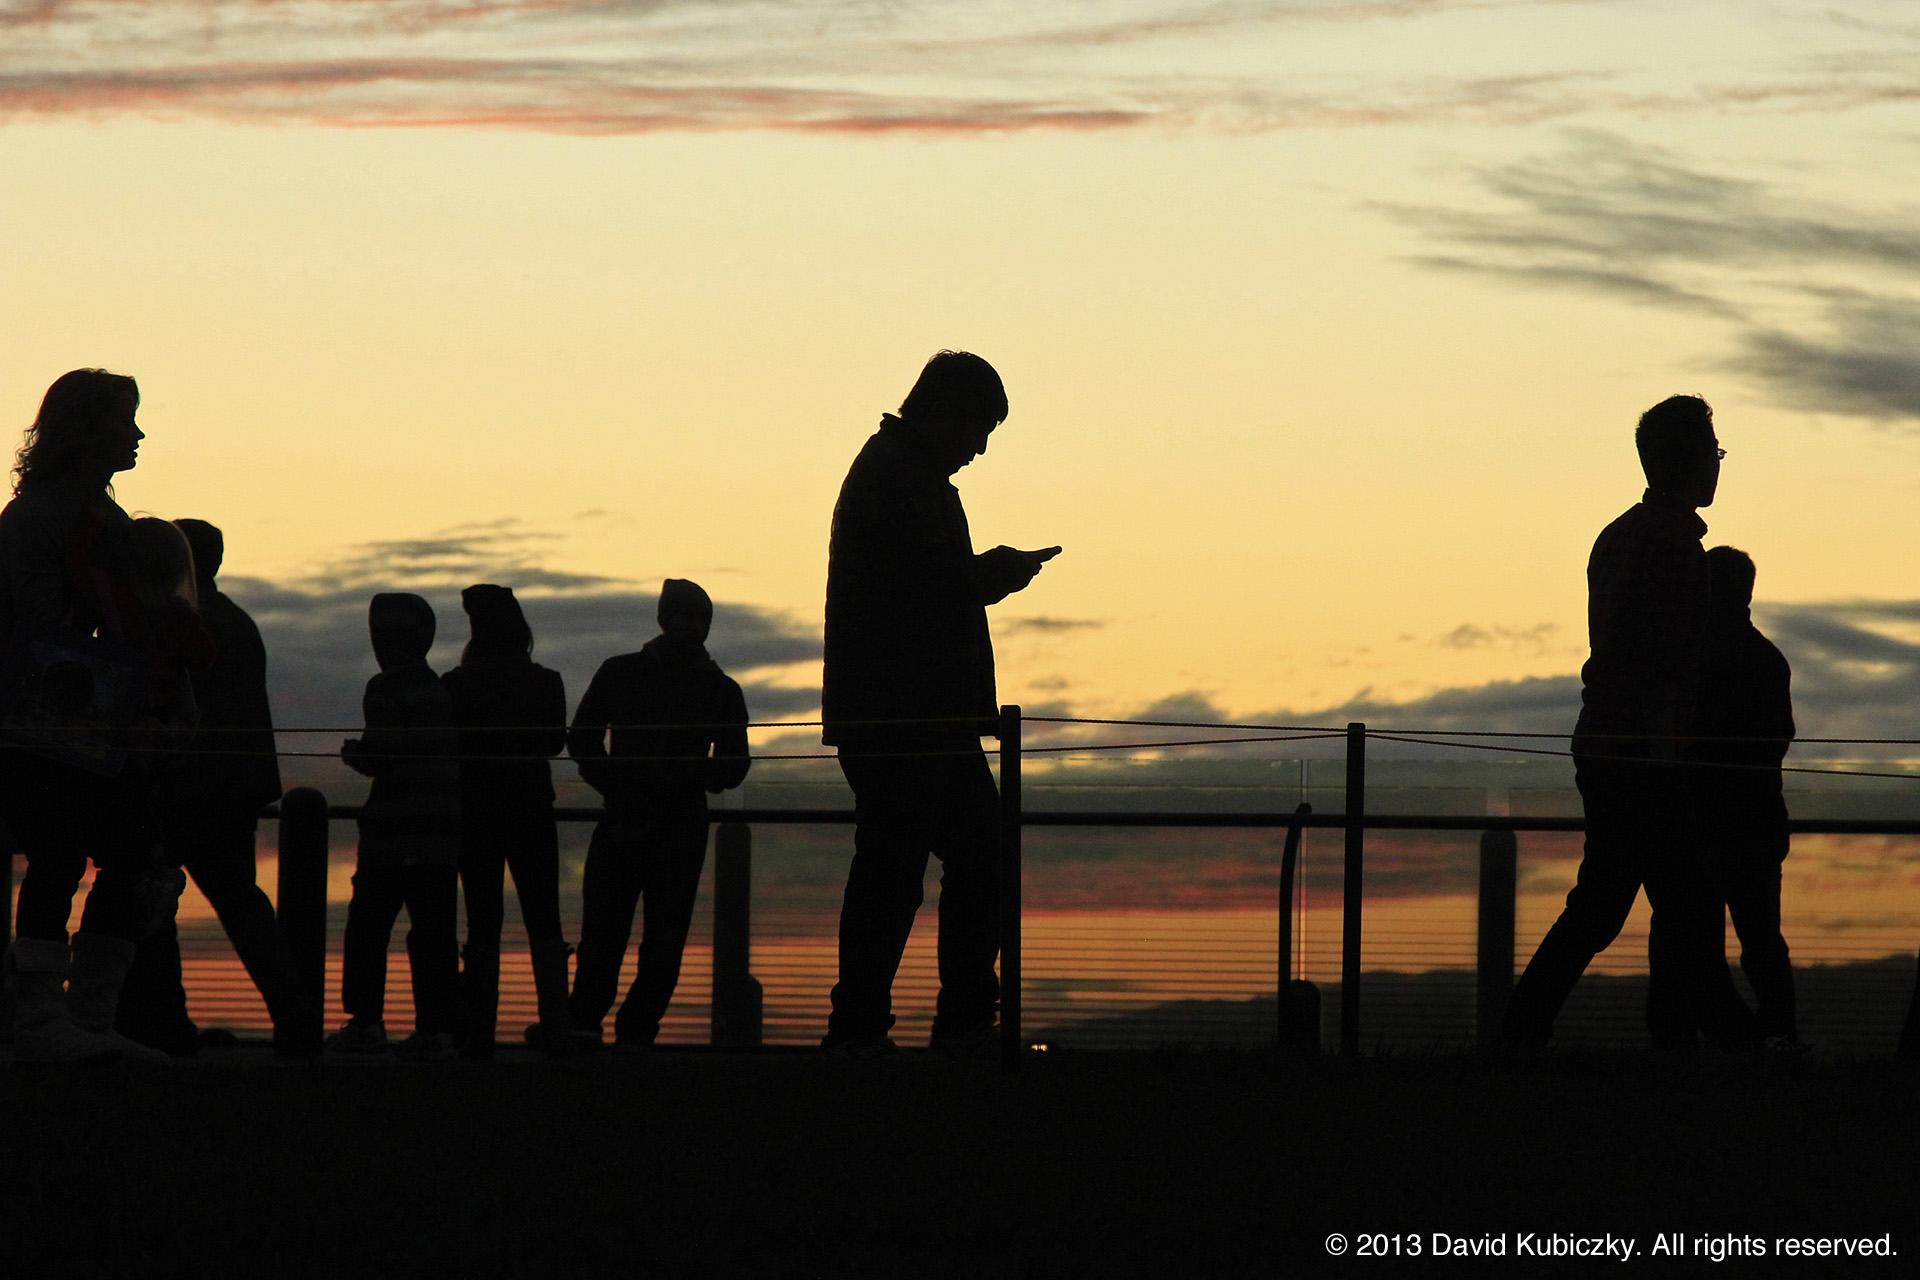 Sunset-Silhouette-3-c.jpg